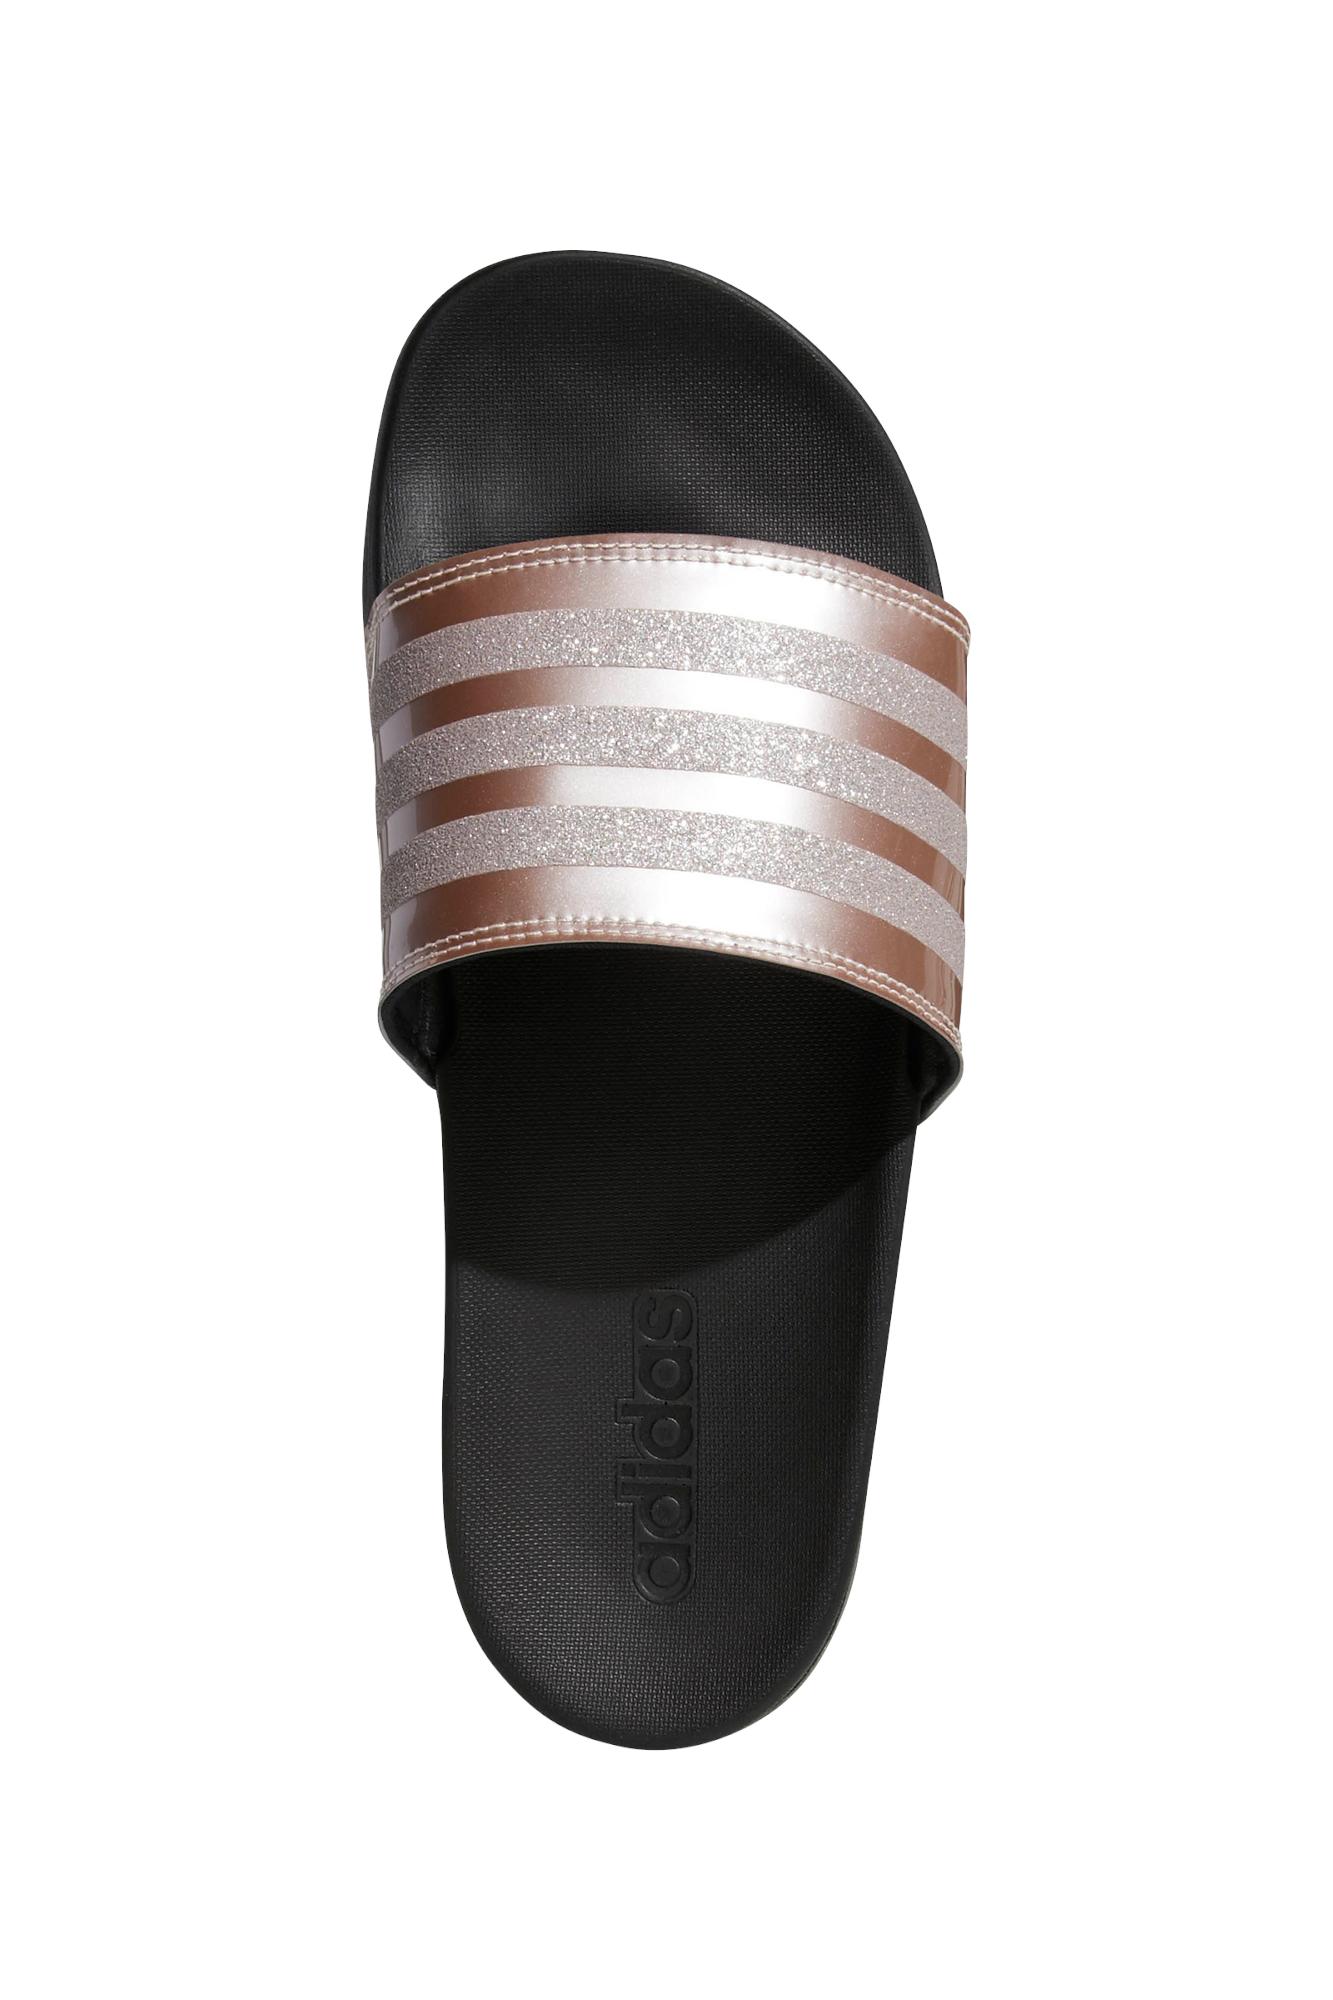 1c3f1af1 Klapki adidas Adilette Cloudfoam Plus Explorer - B75679 / Klapki ...